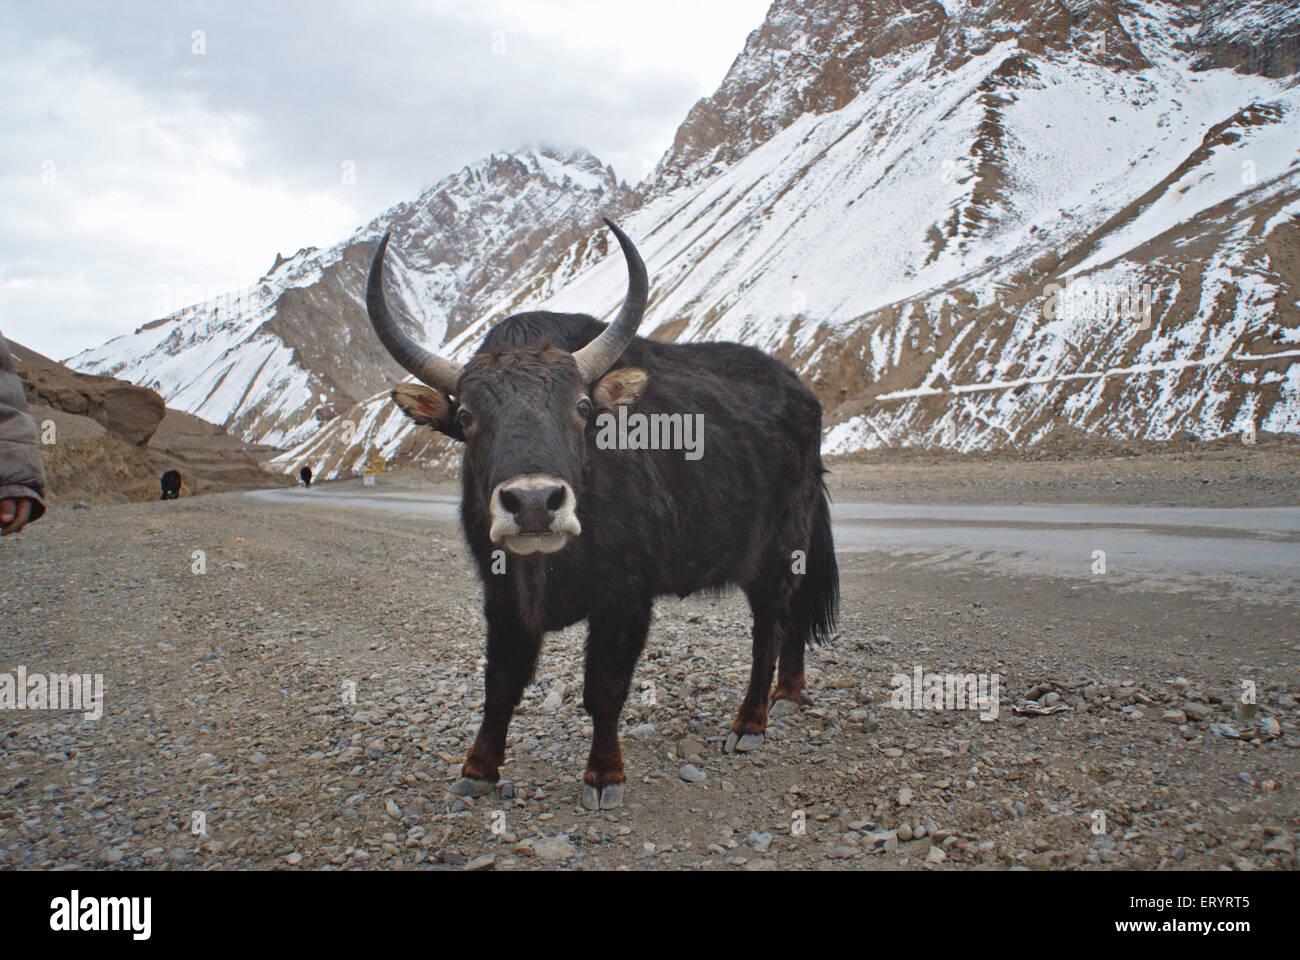 Himalayan yak poephagus grunniens ; Ladakh ; Jammu and Kashmir ; India 10 April 2008 - Stock Image